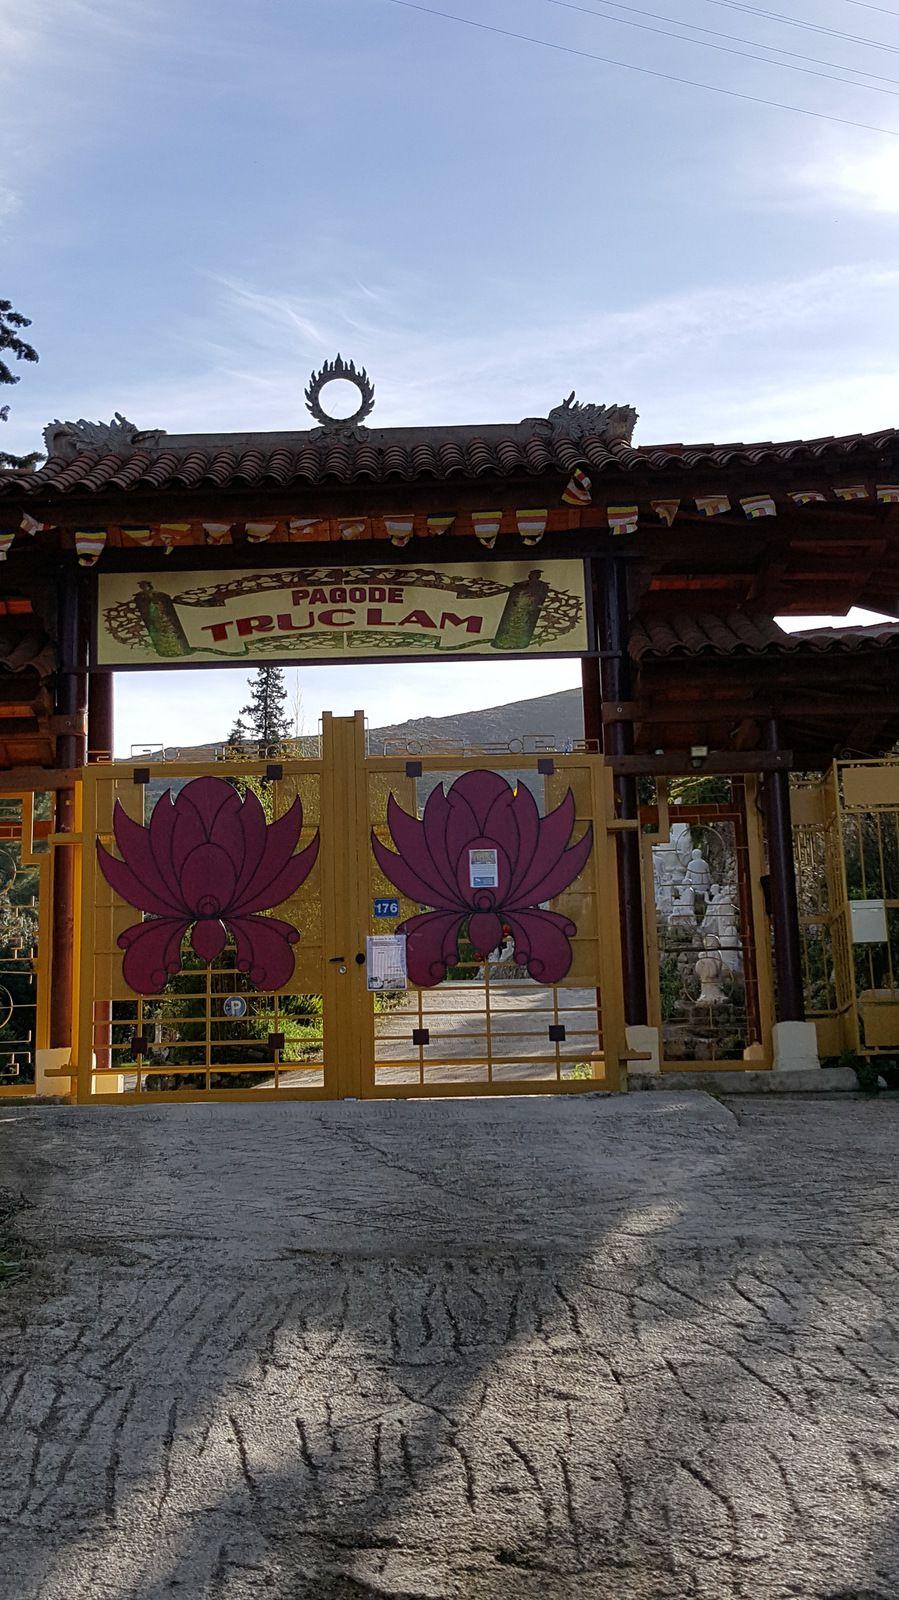 2020-02-06 De la croix de St. Marcel à la pagode Truc Lam